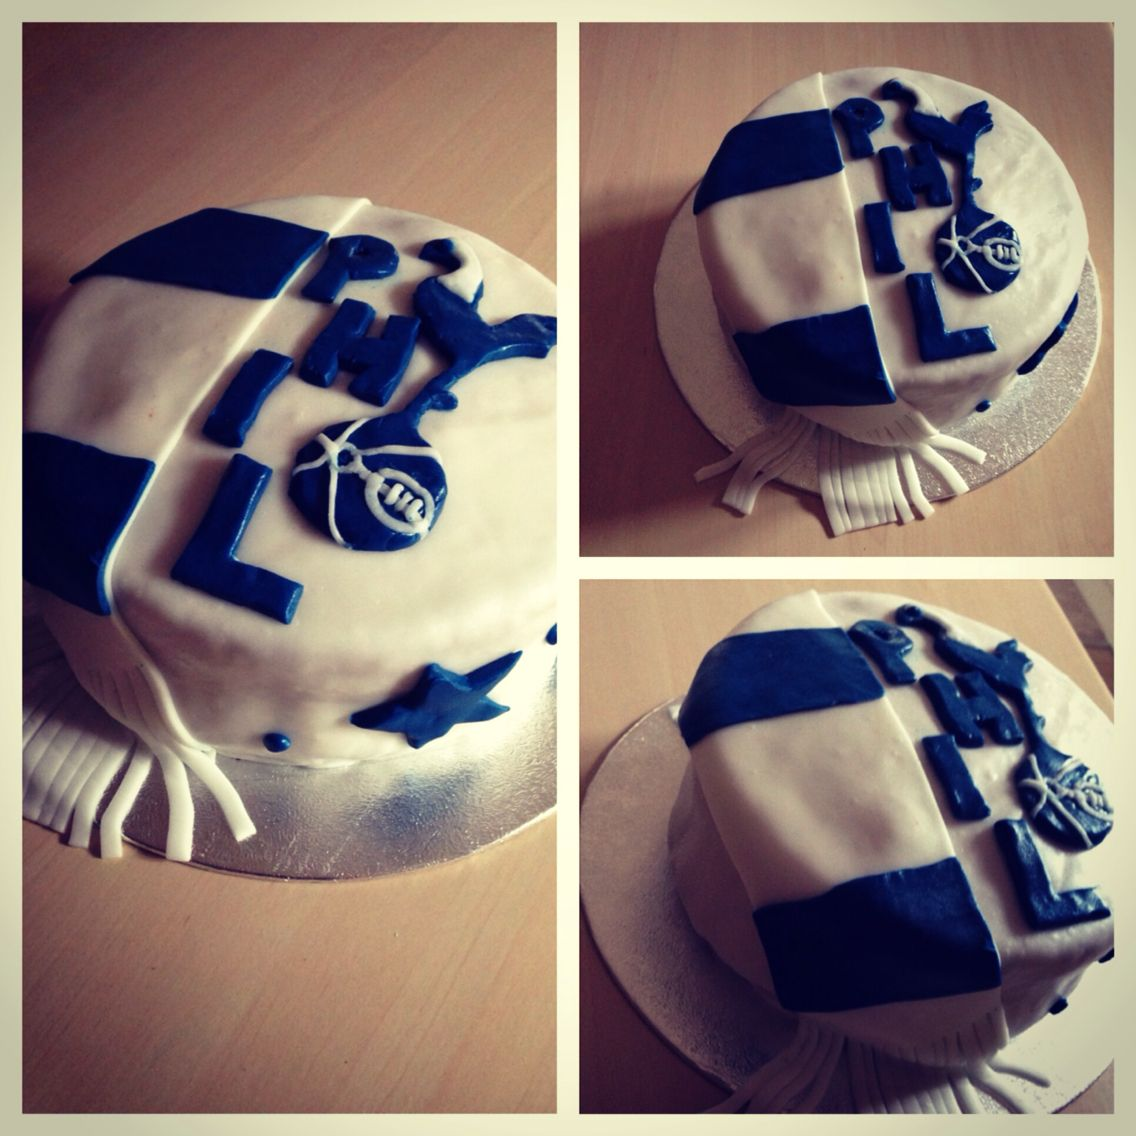 This years birthday cake for Phil! Tottenham Hotspur